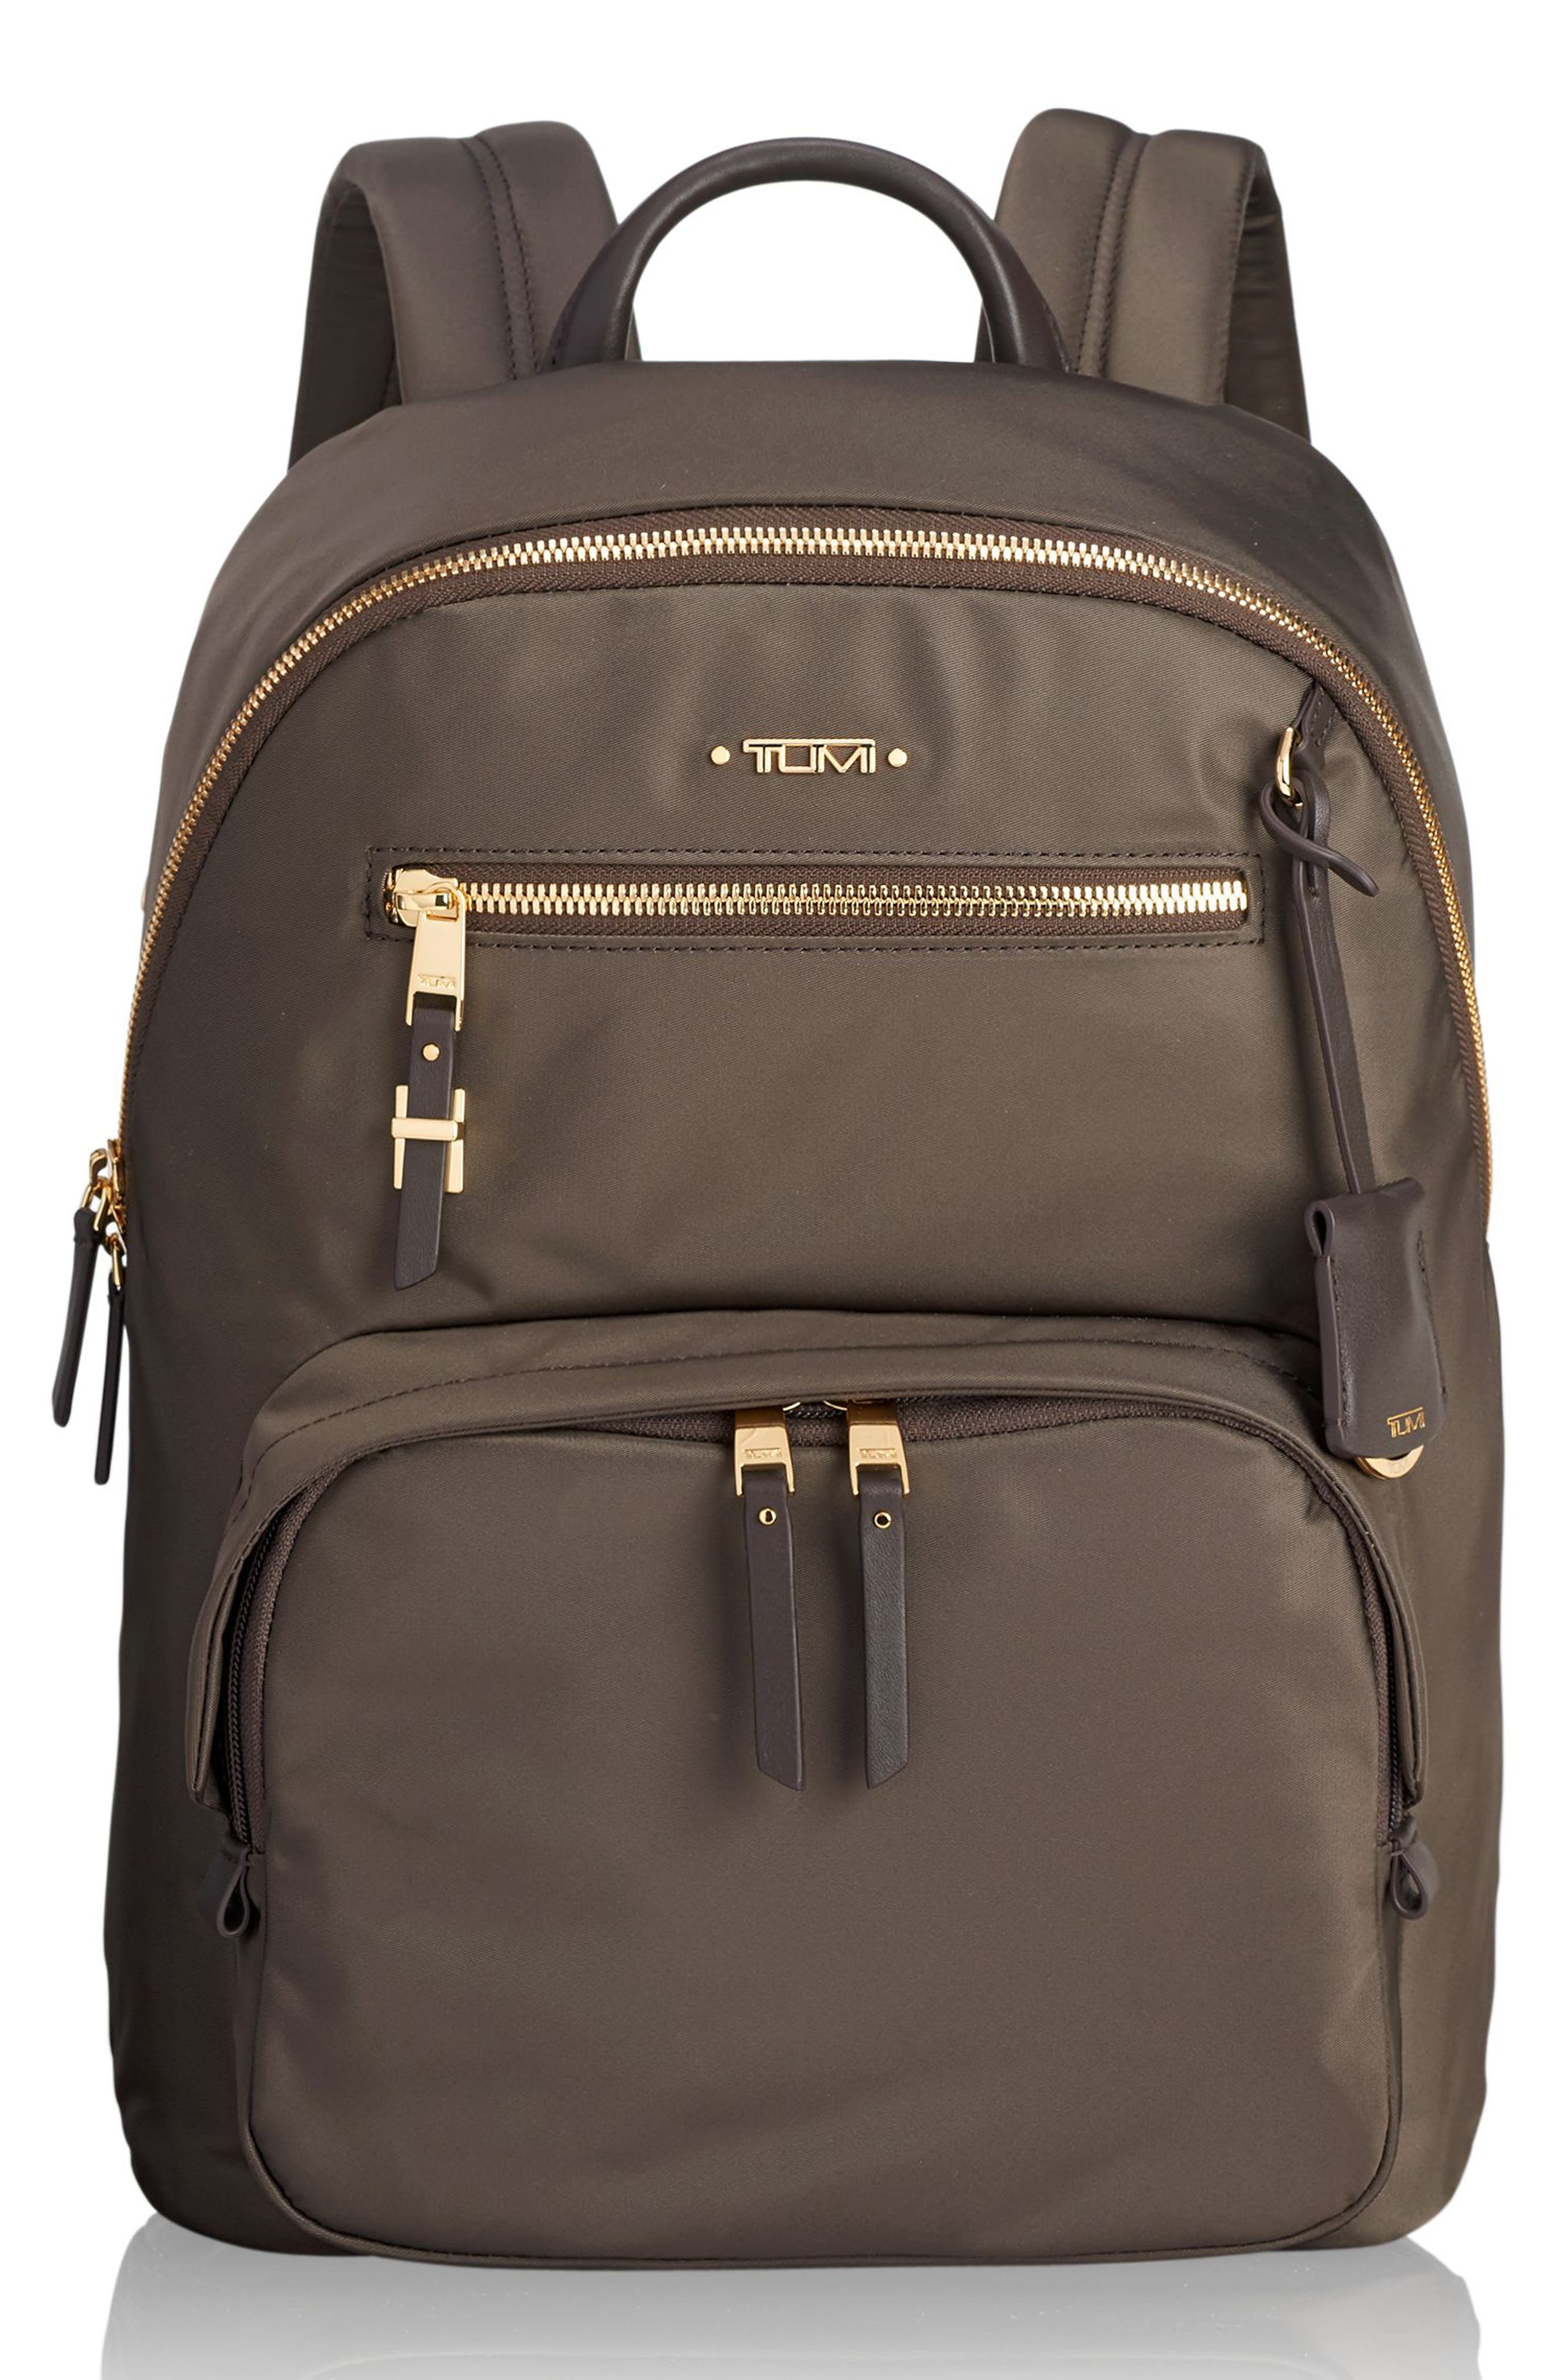 Voyageur Hagen Nylon Backpack - Brown in Mink